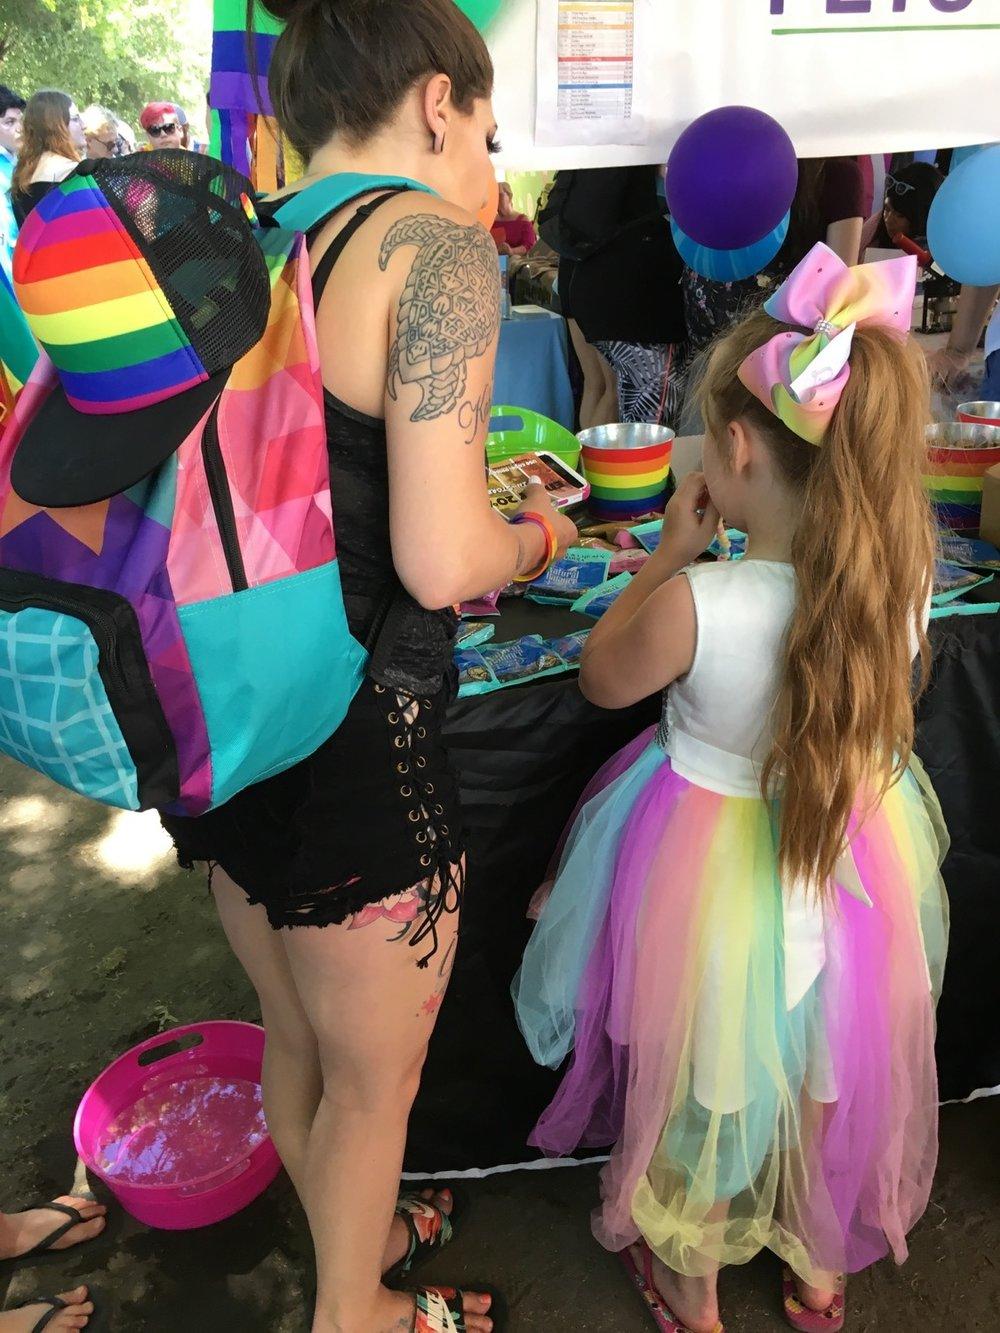 Pride wear everywhere